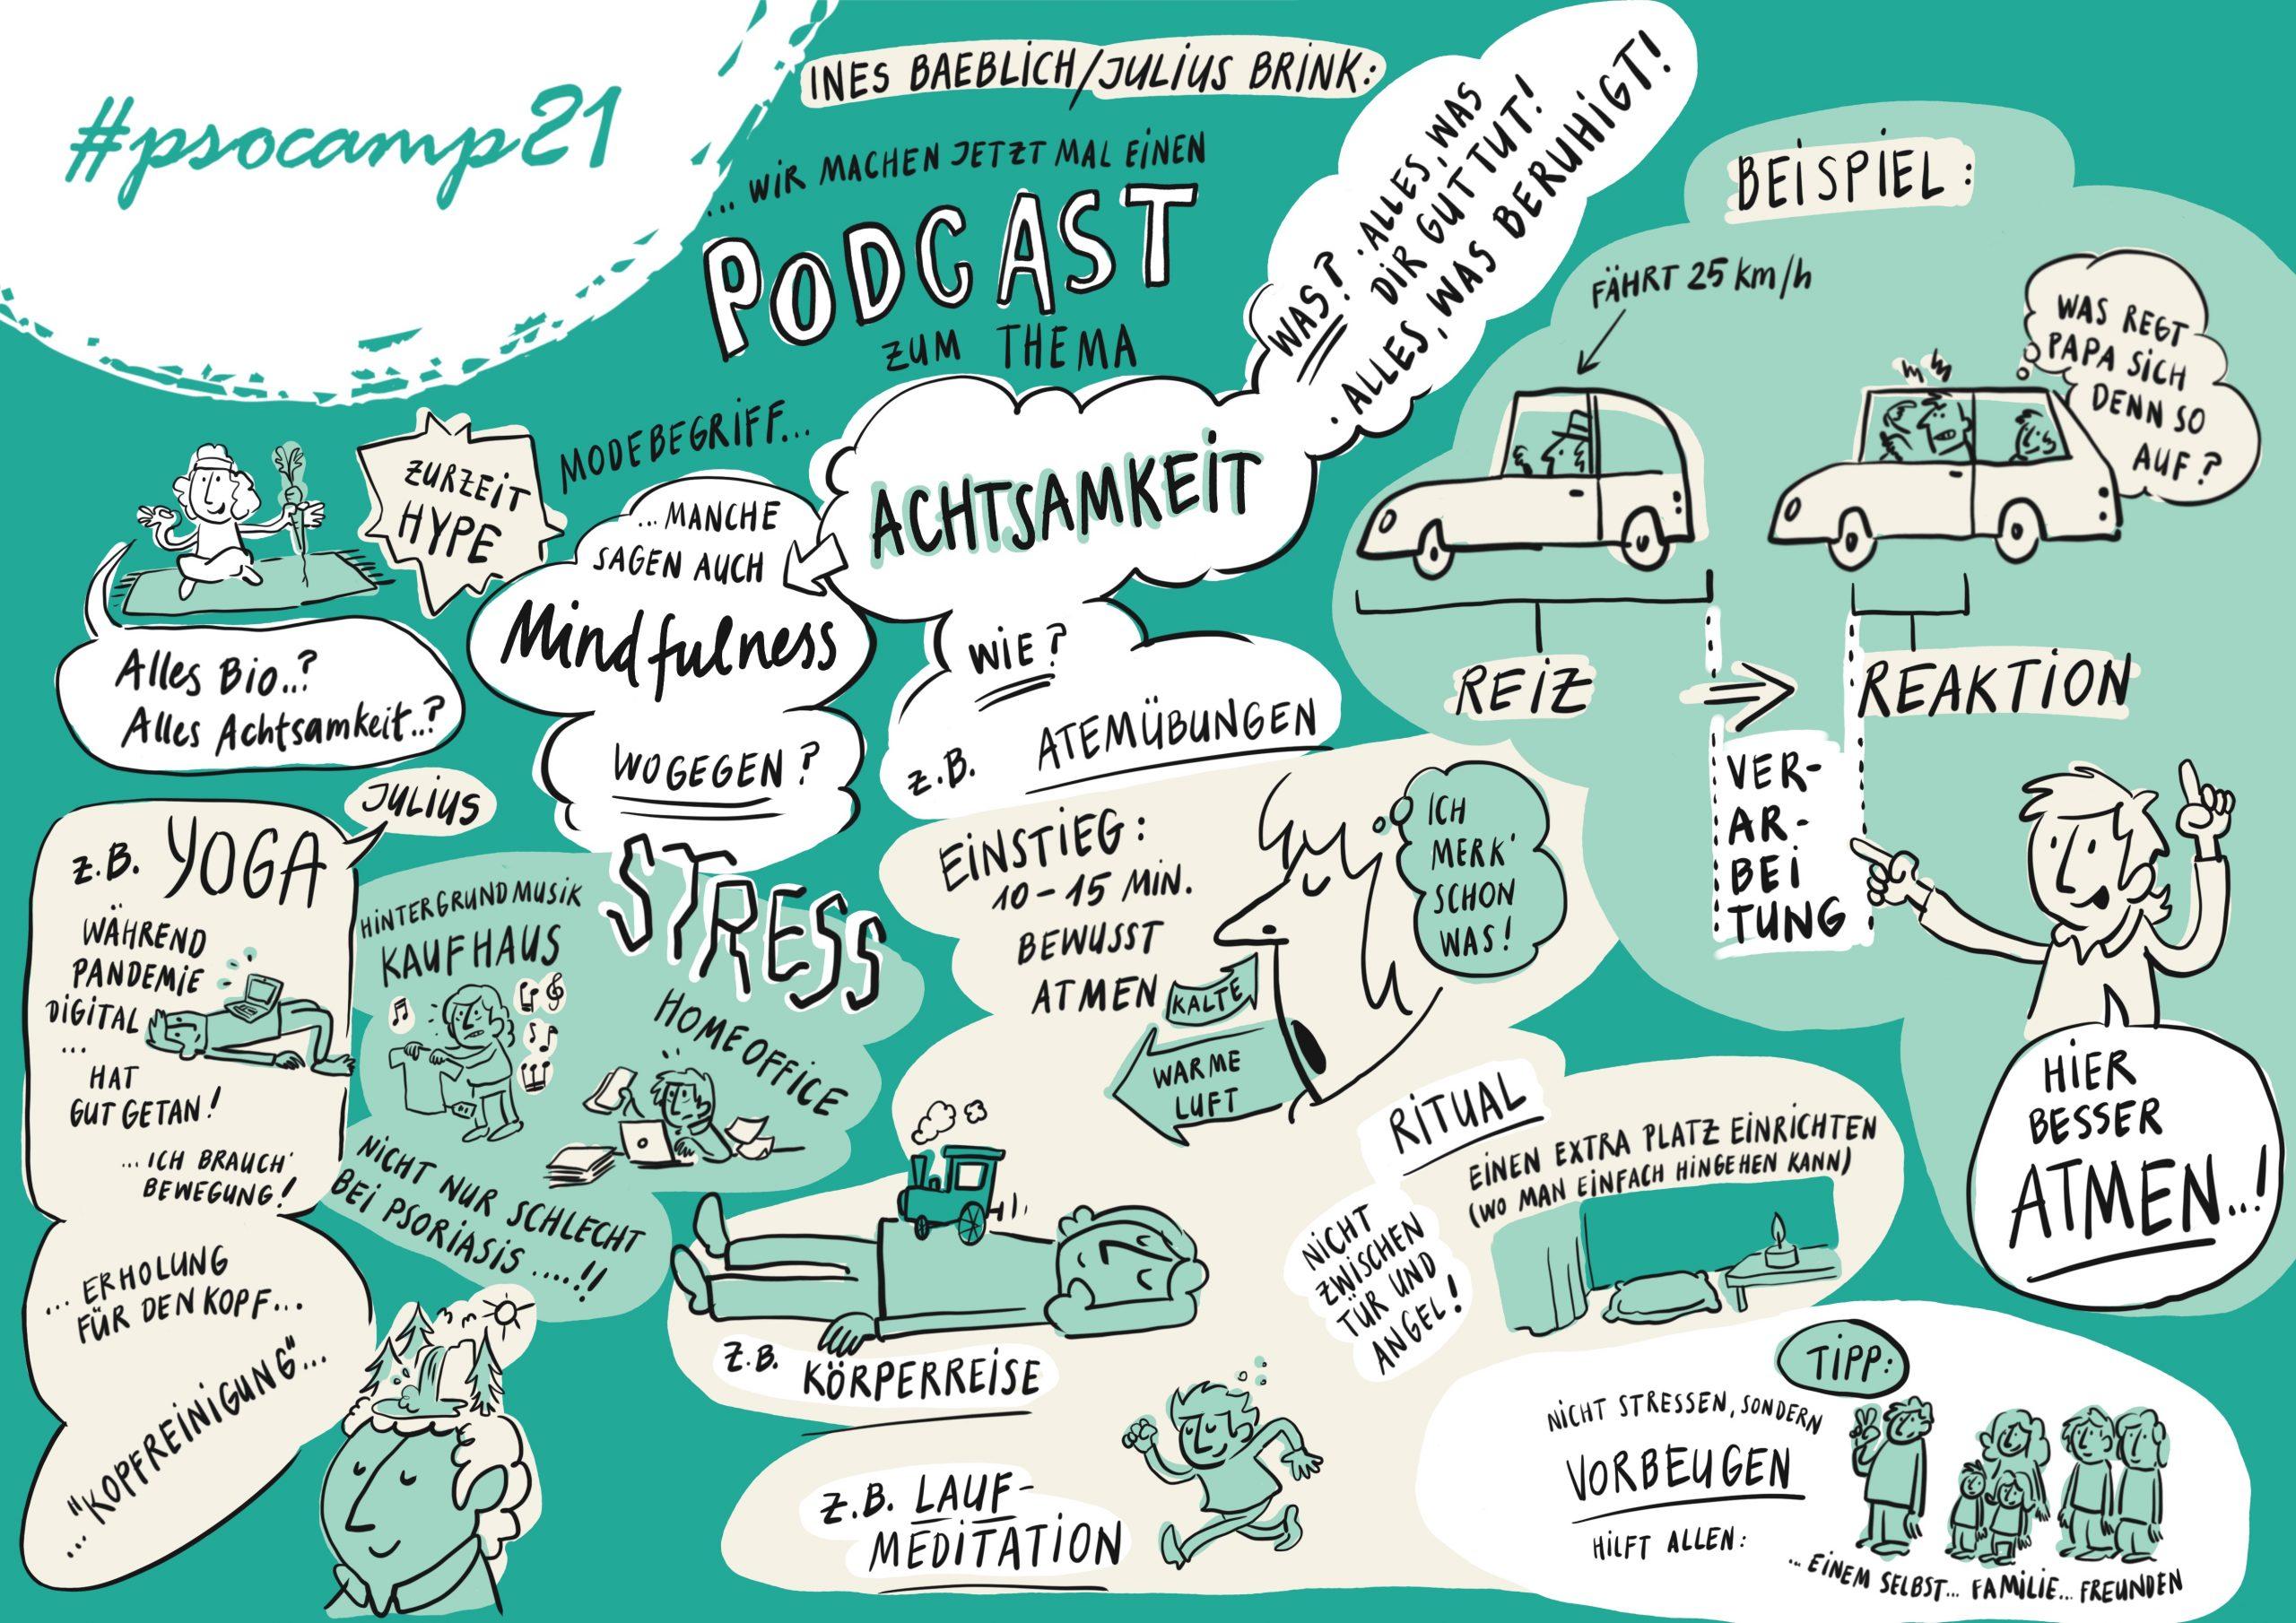 PsoCamp21-Atmen   Wolfgang Friesslich